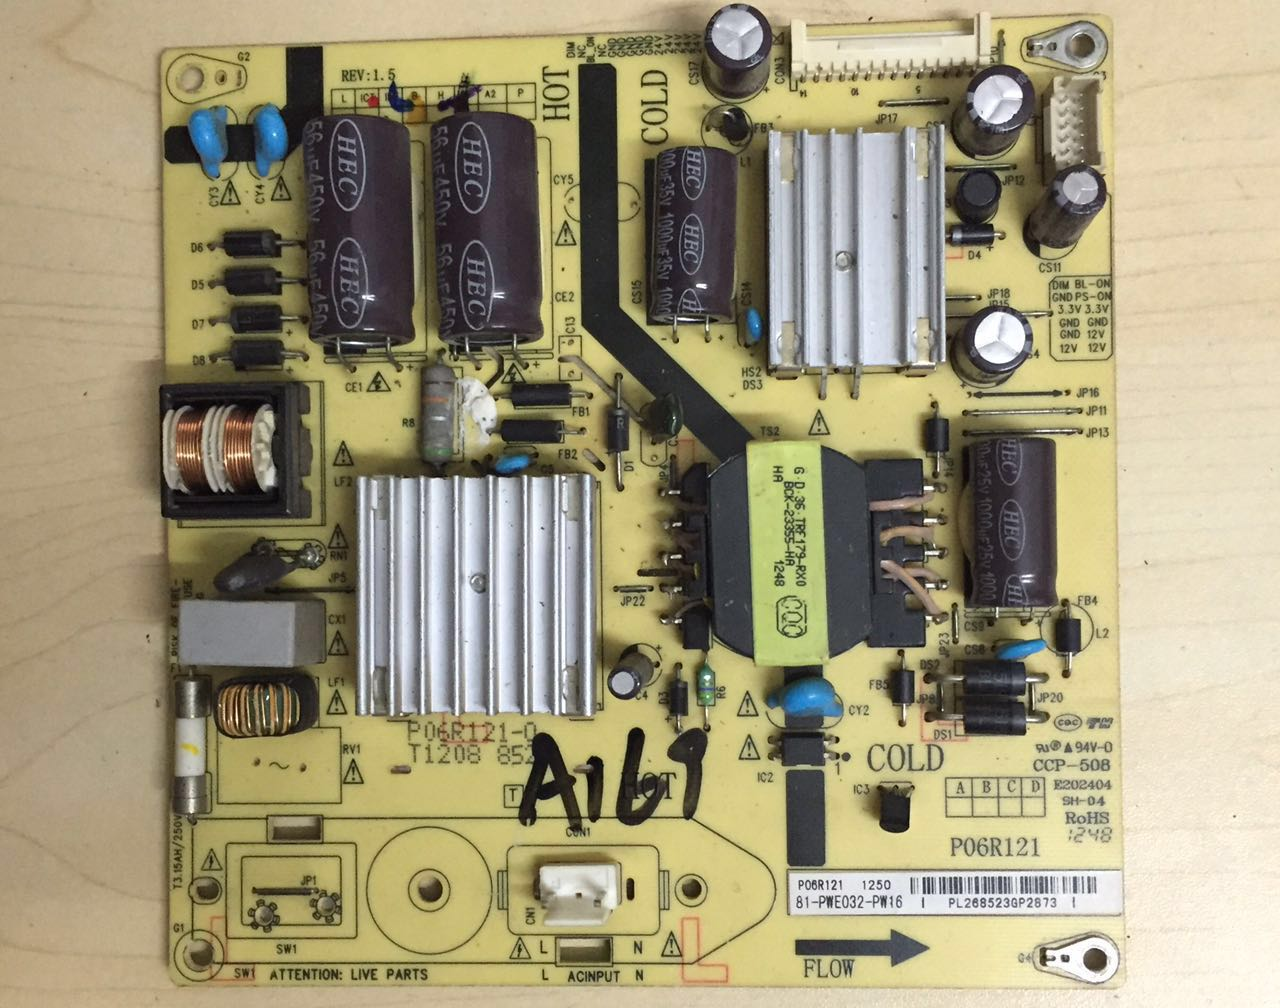 Test the original TCL LCD TV 32 inch power board E202404 circuit board SH-04